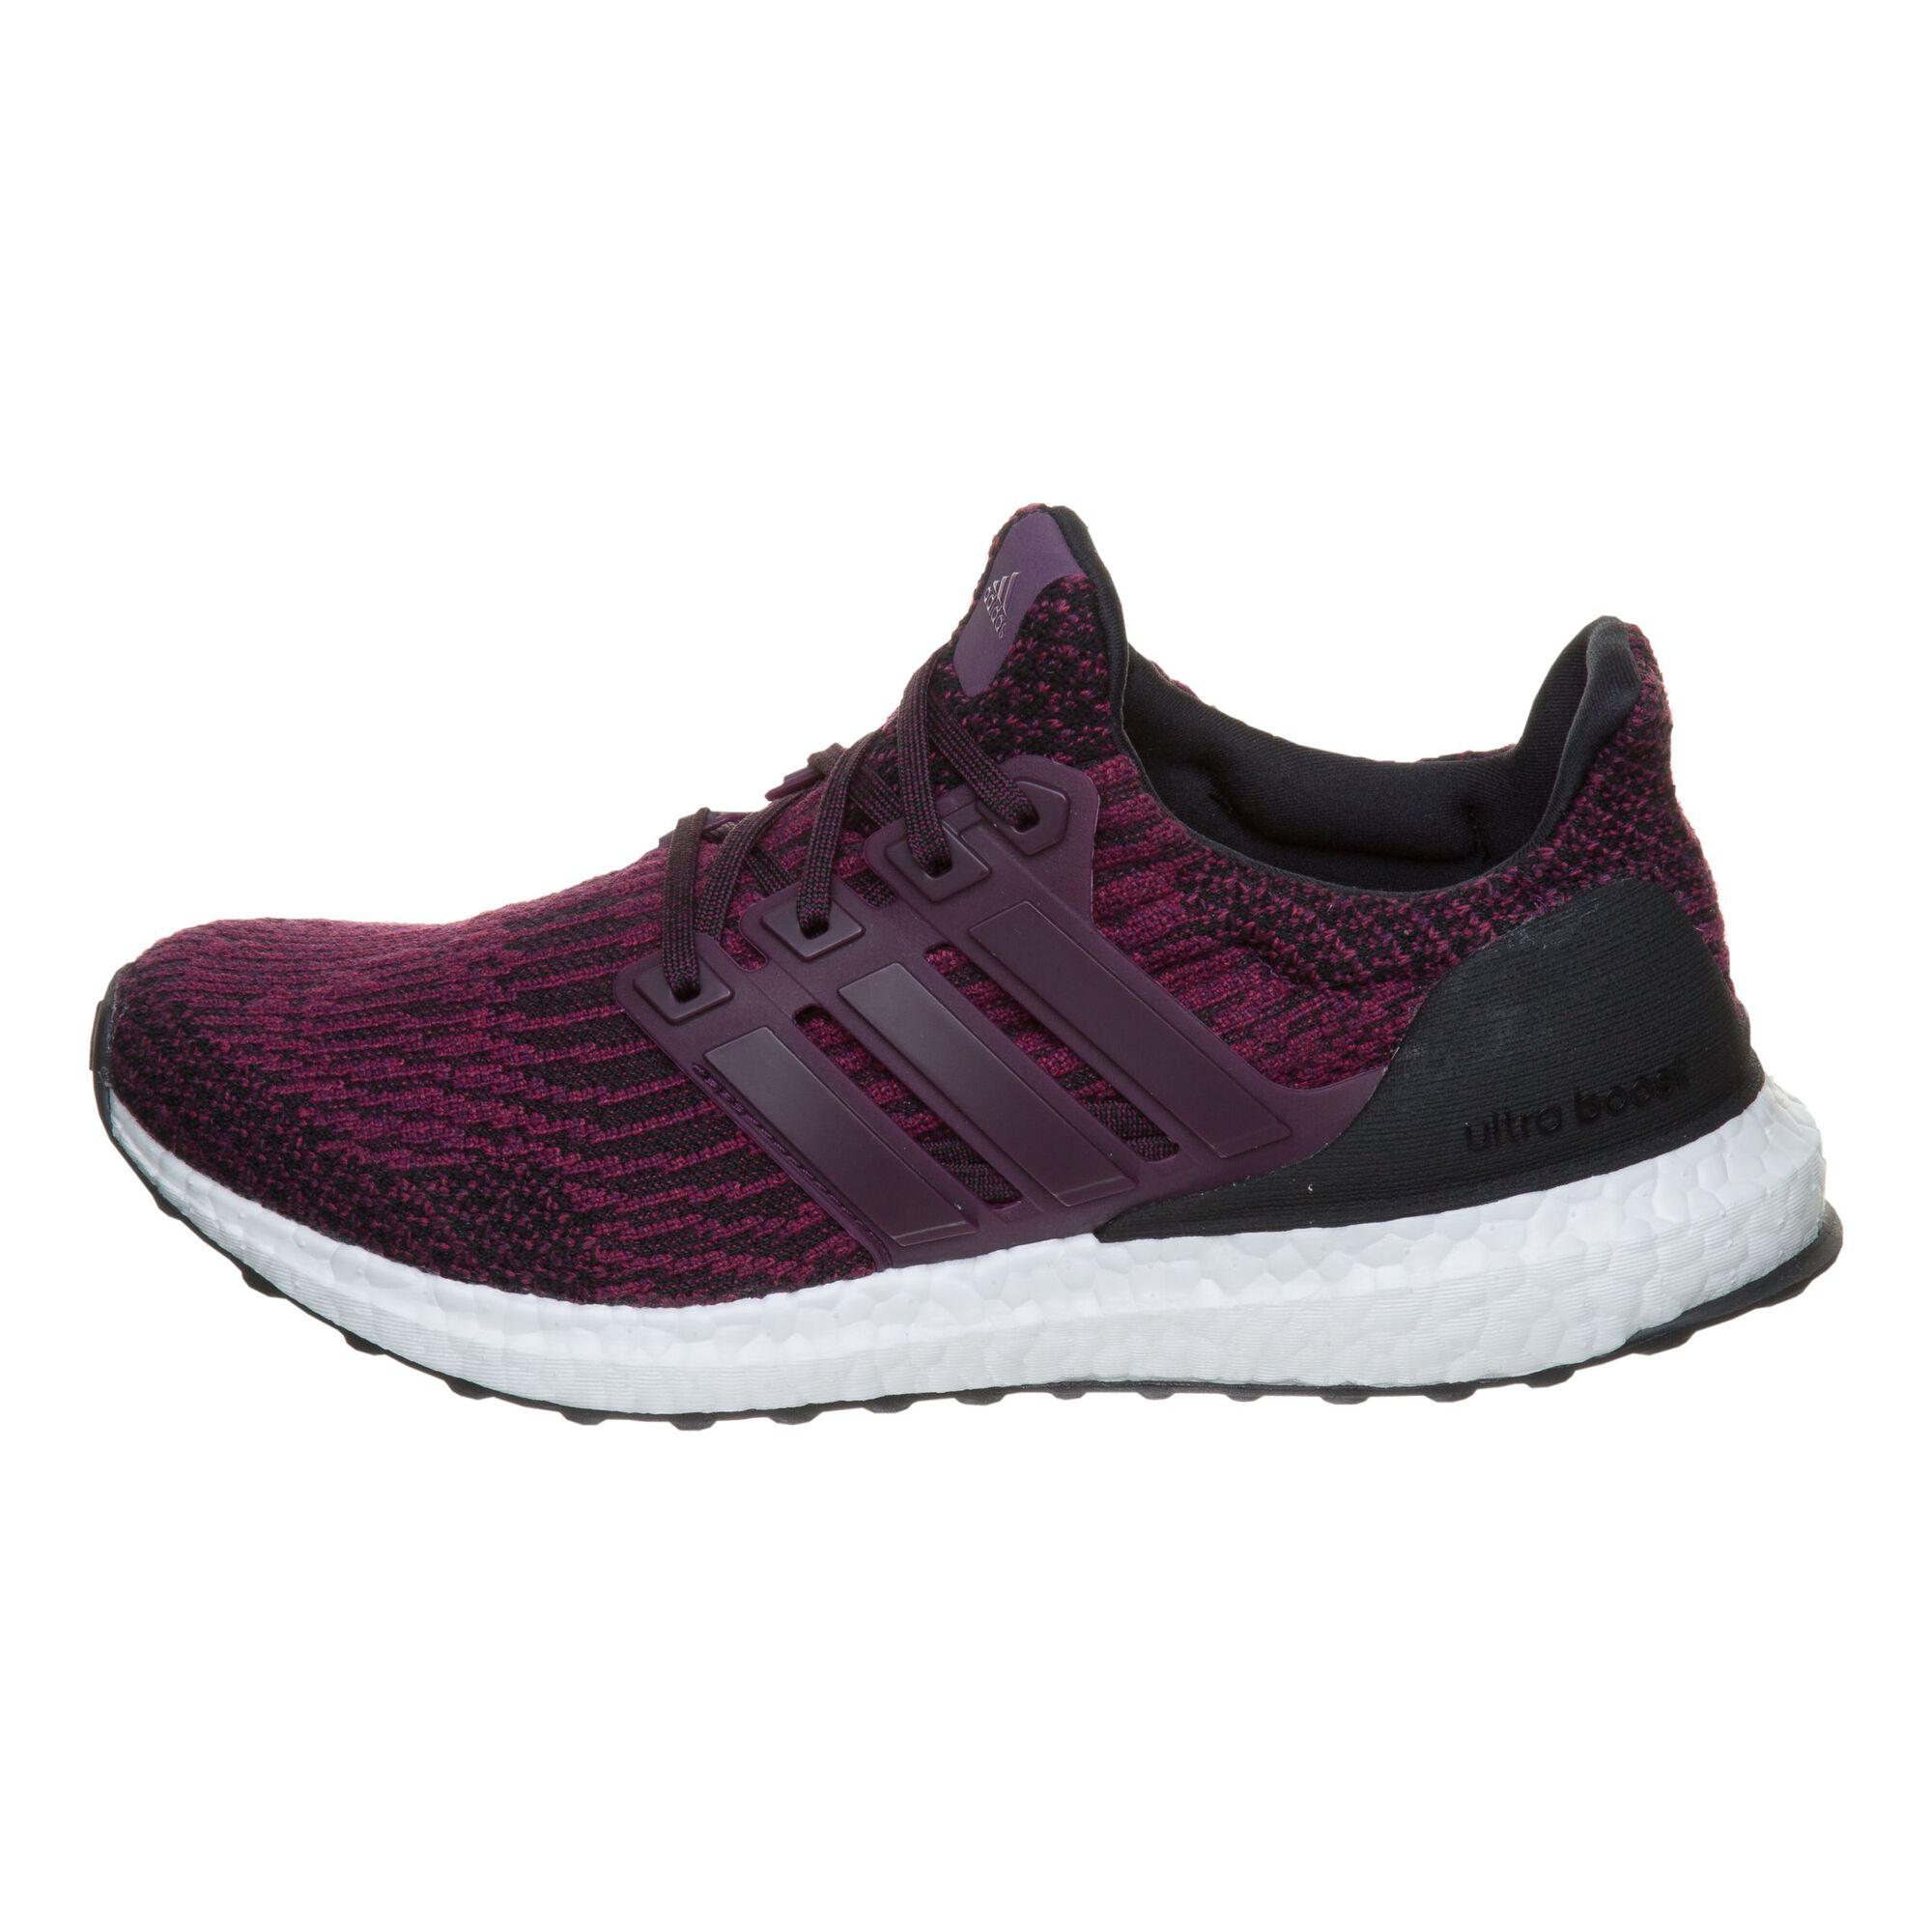 purchase cheap bbb33 d8045 adidas · adidas · adidas · adidas · adidas · adidas · adidas · adidas ·  adidas · adidas. Ultra BOOST Women ...